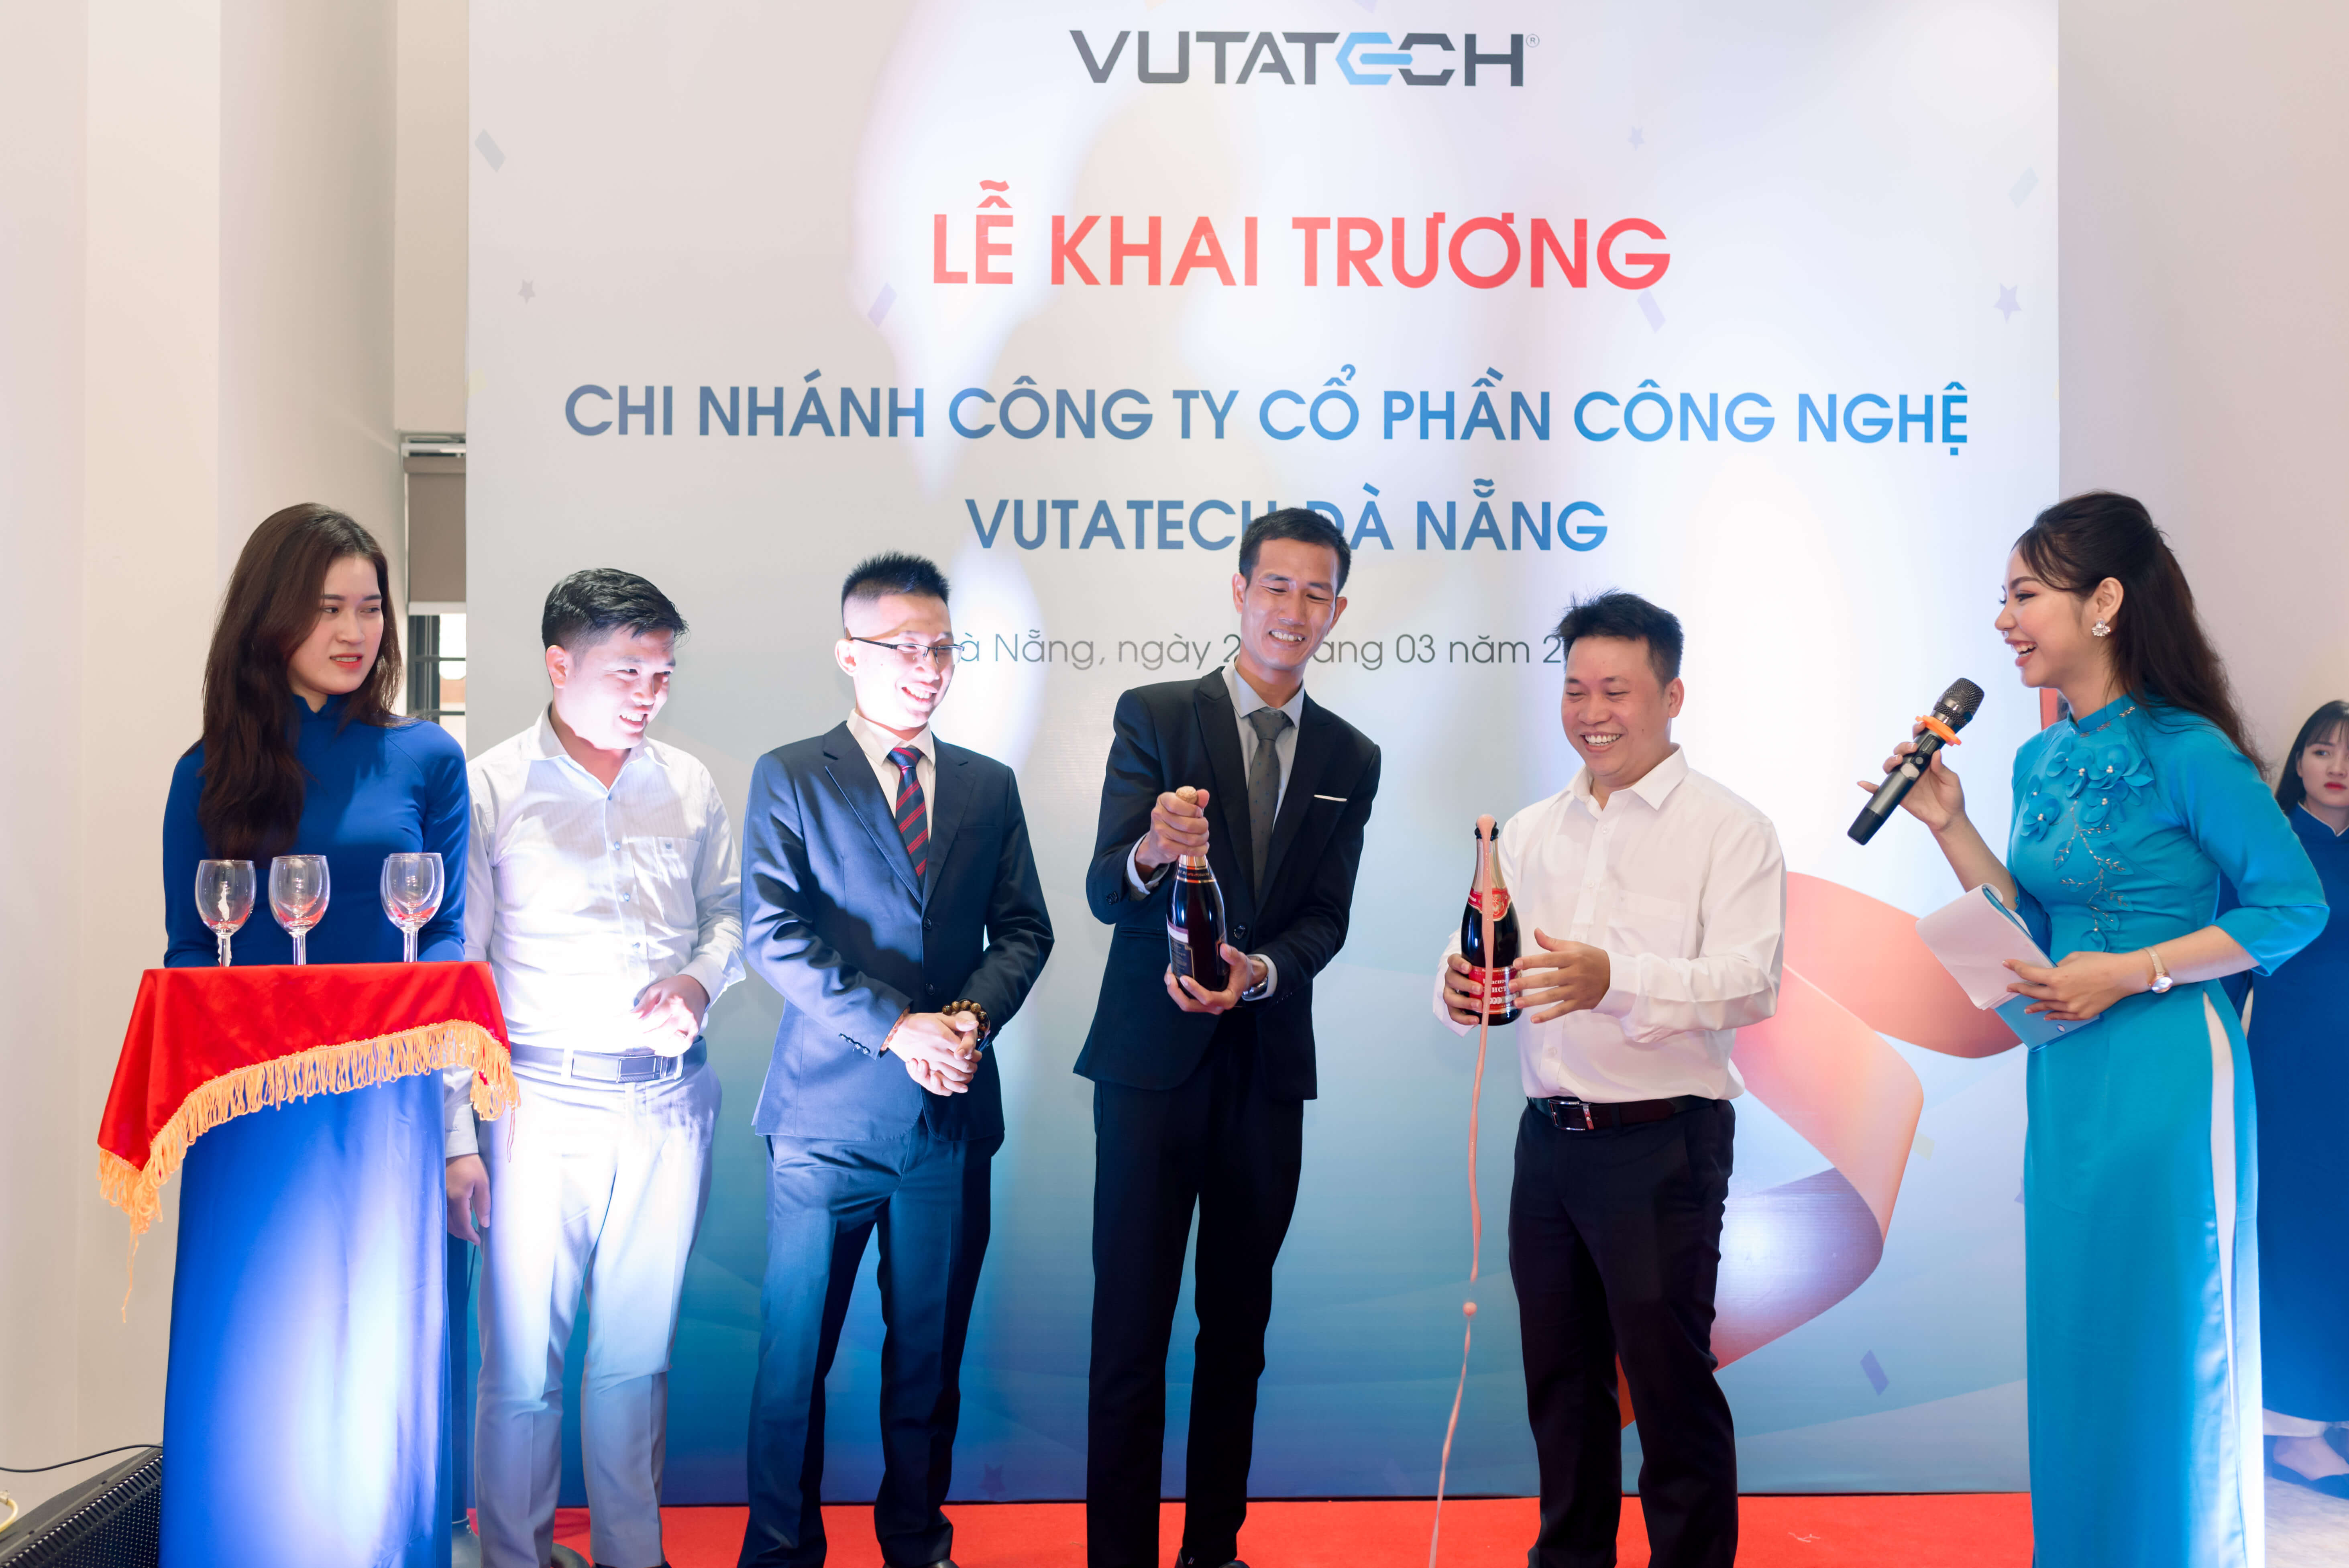 VUTATECH OPENING A NEW OFFICE IN DA NANG CITY